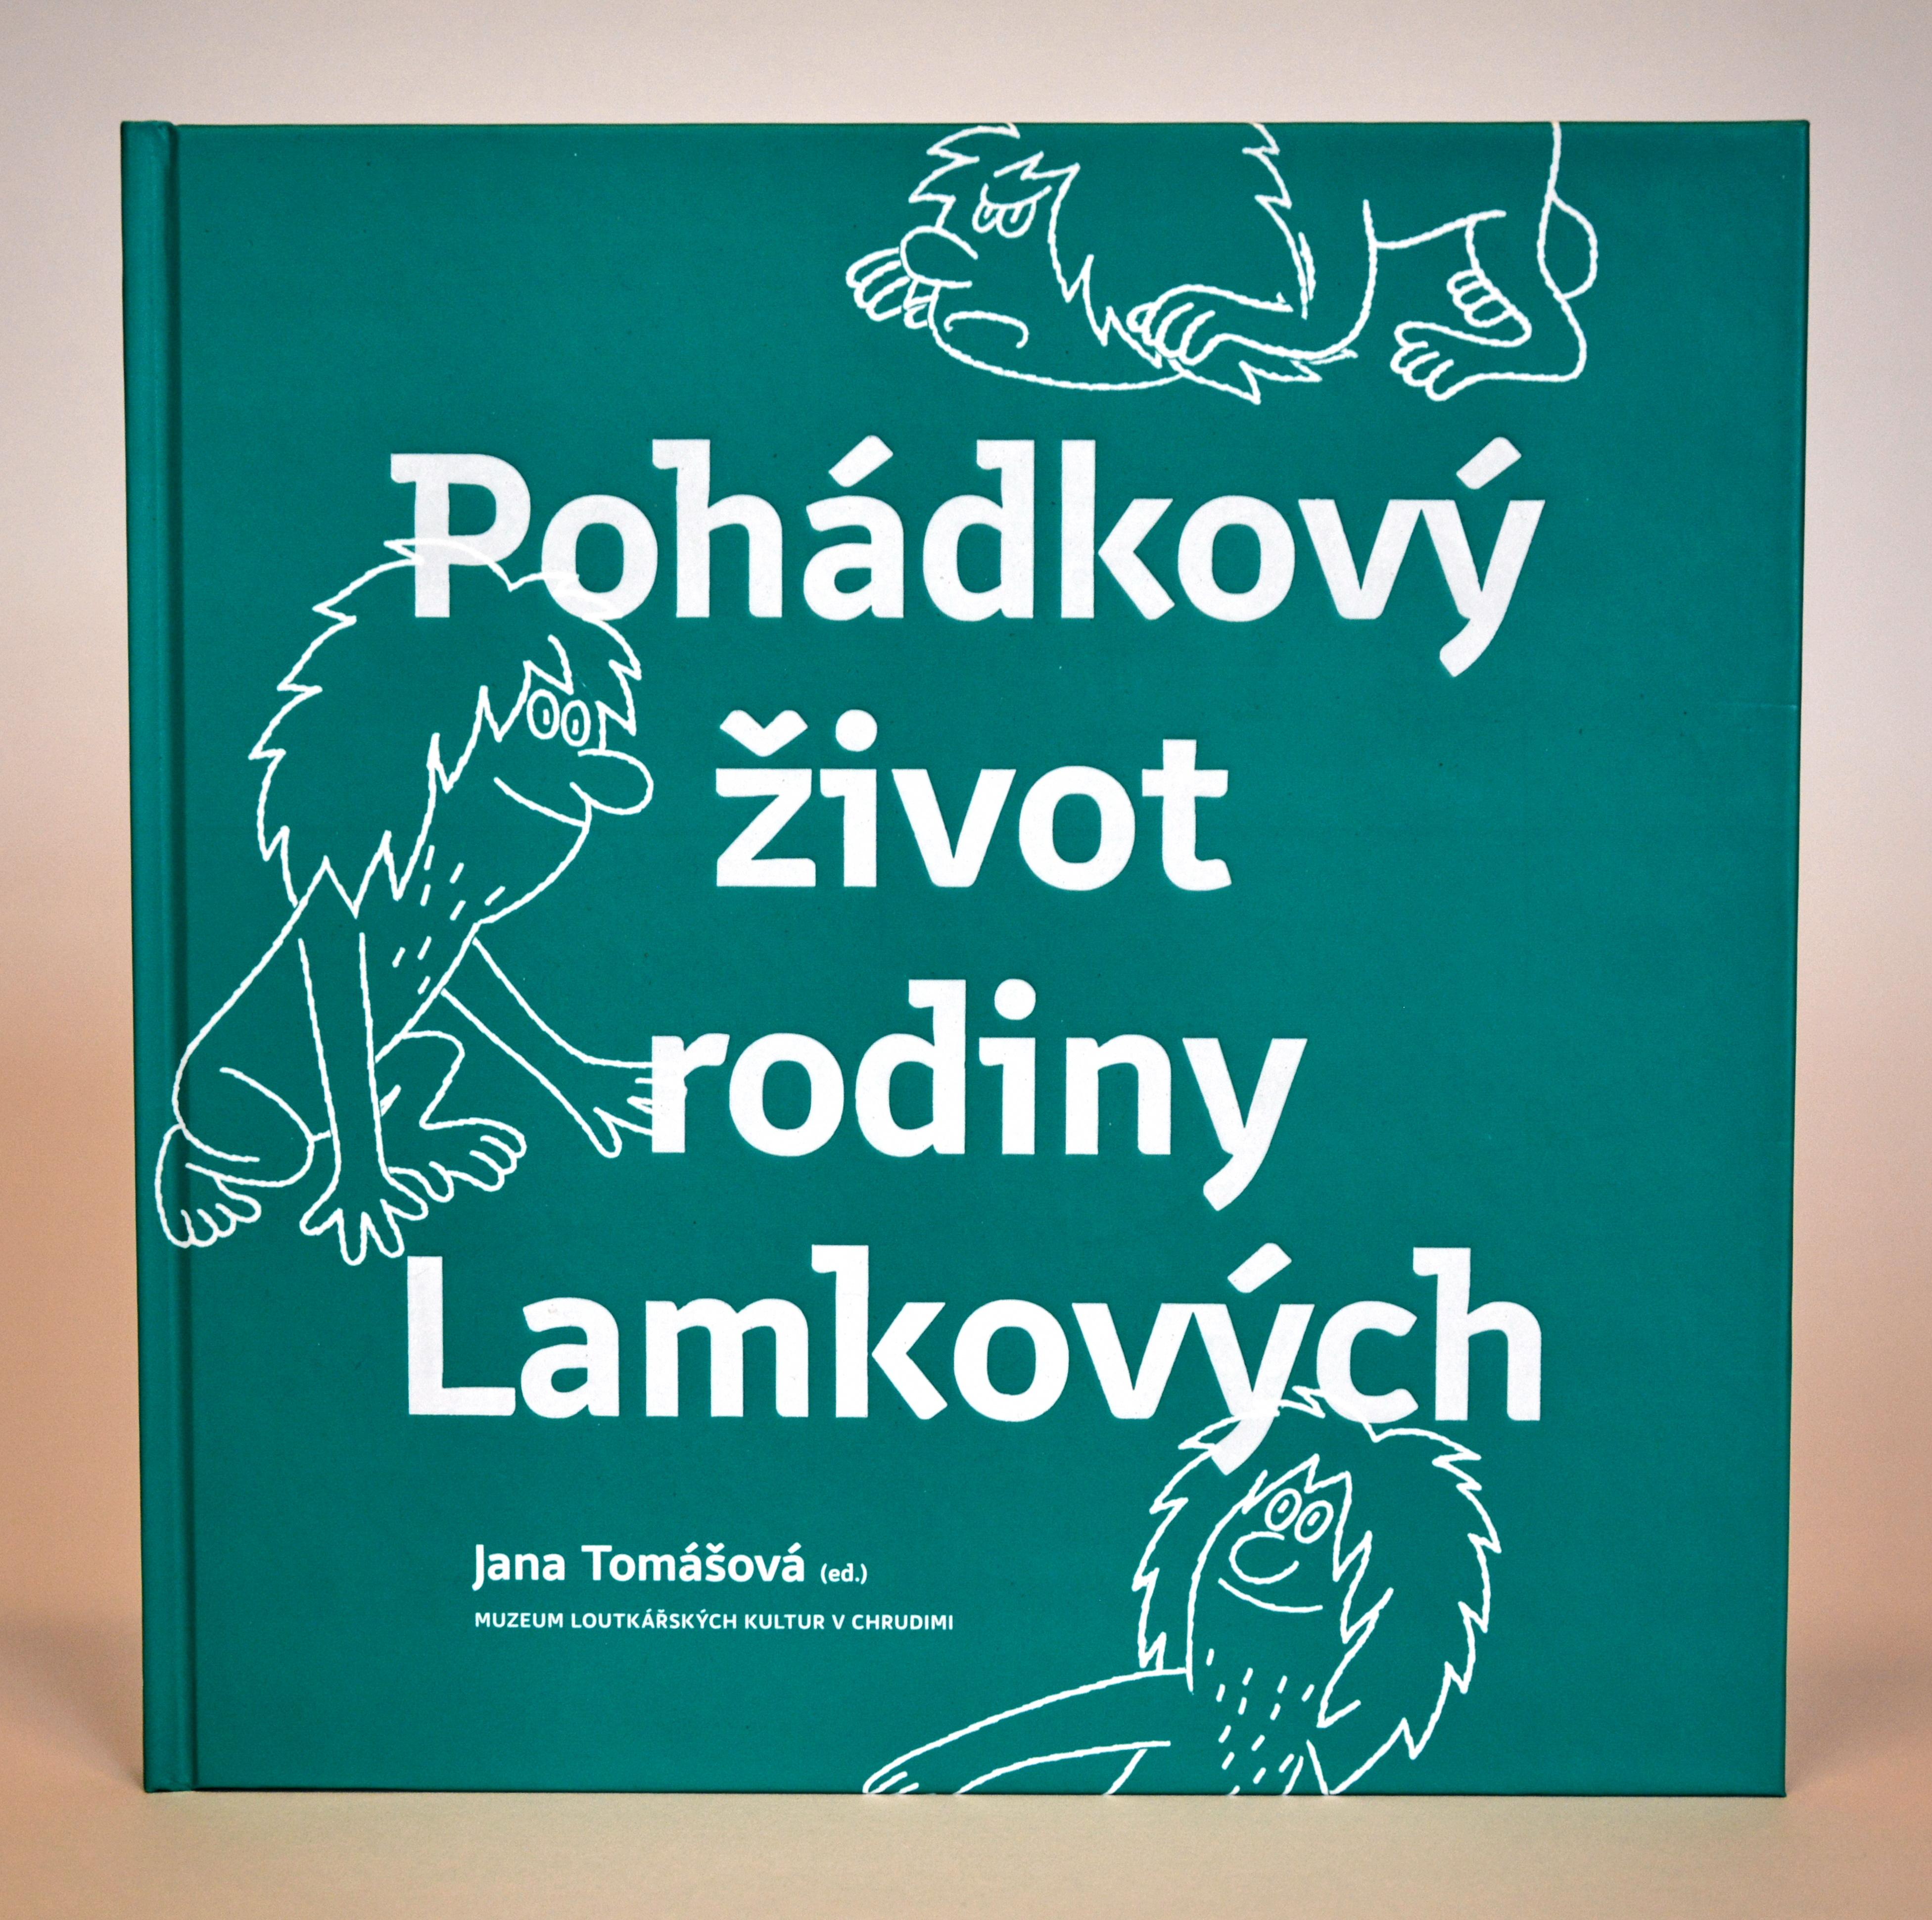 Publikace Mlk Muzeum Loutkarskych Kultur Chrudim